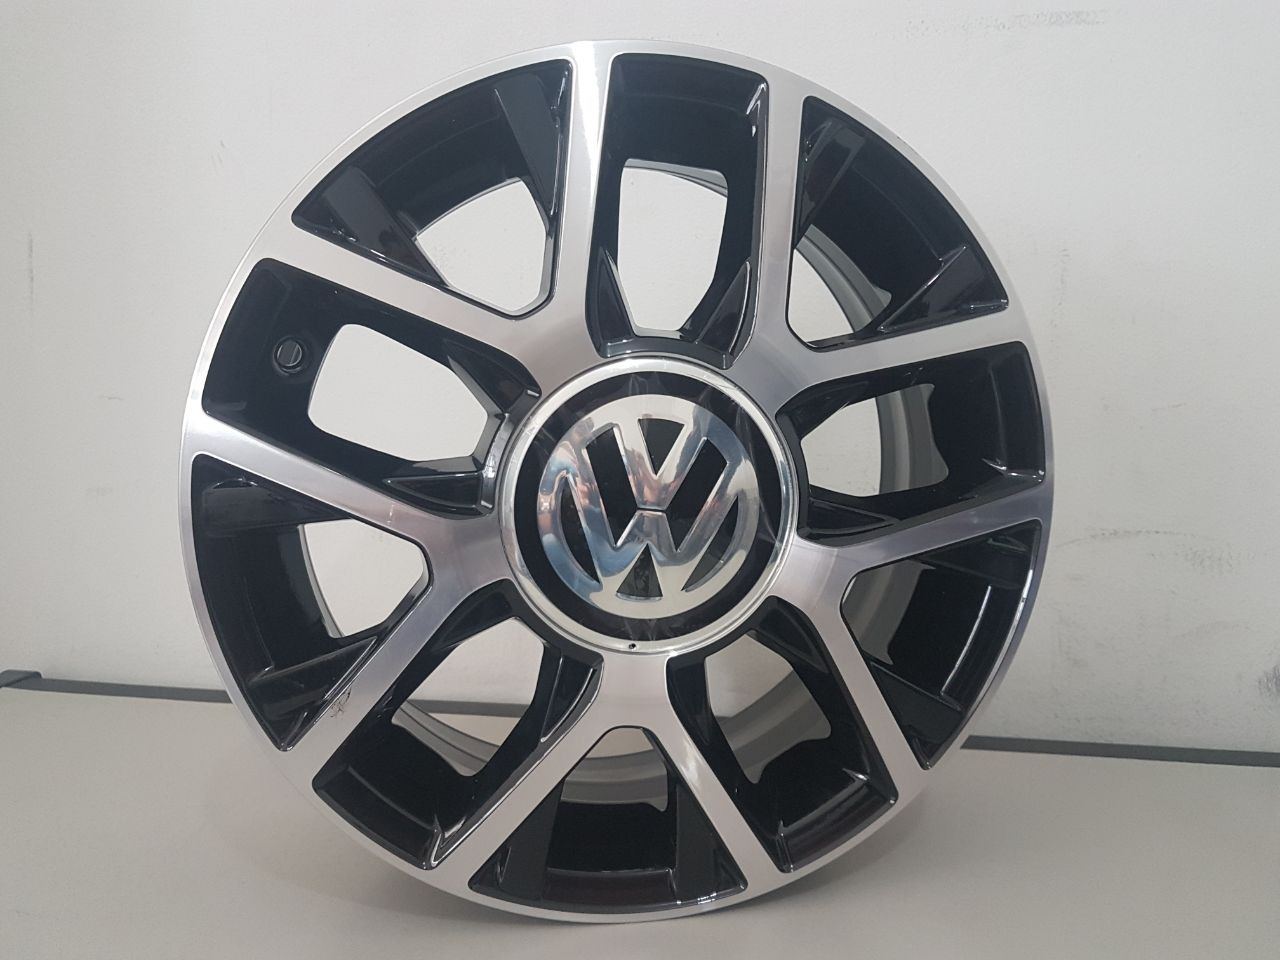 JOGO DE RODA VW CROSS UP ARO 15